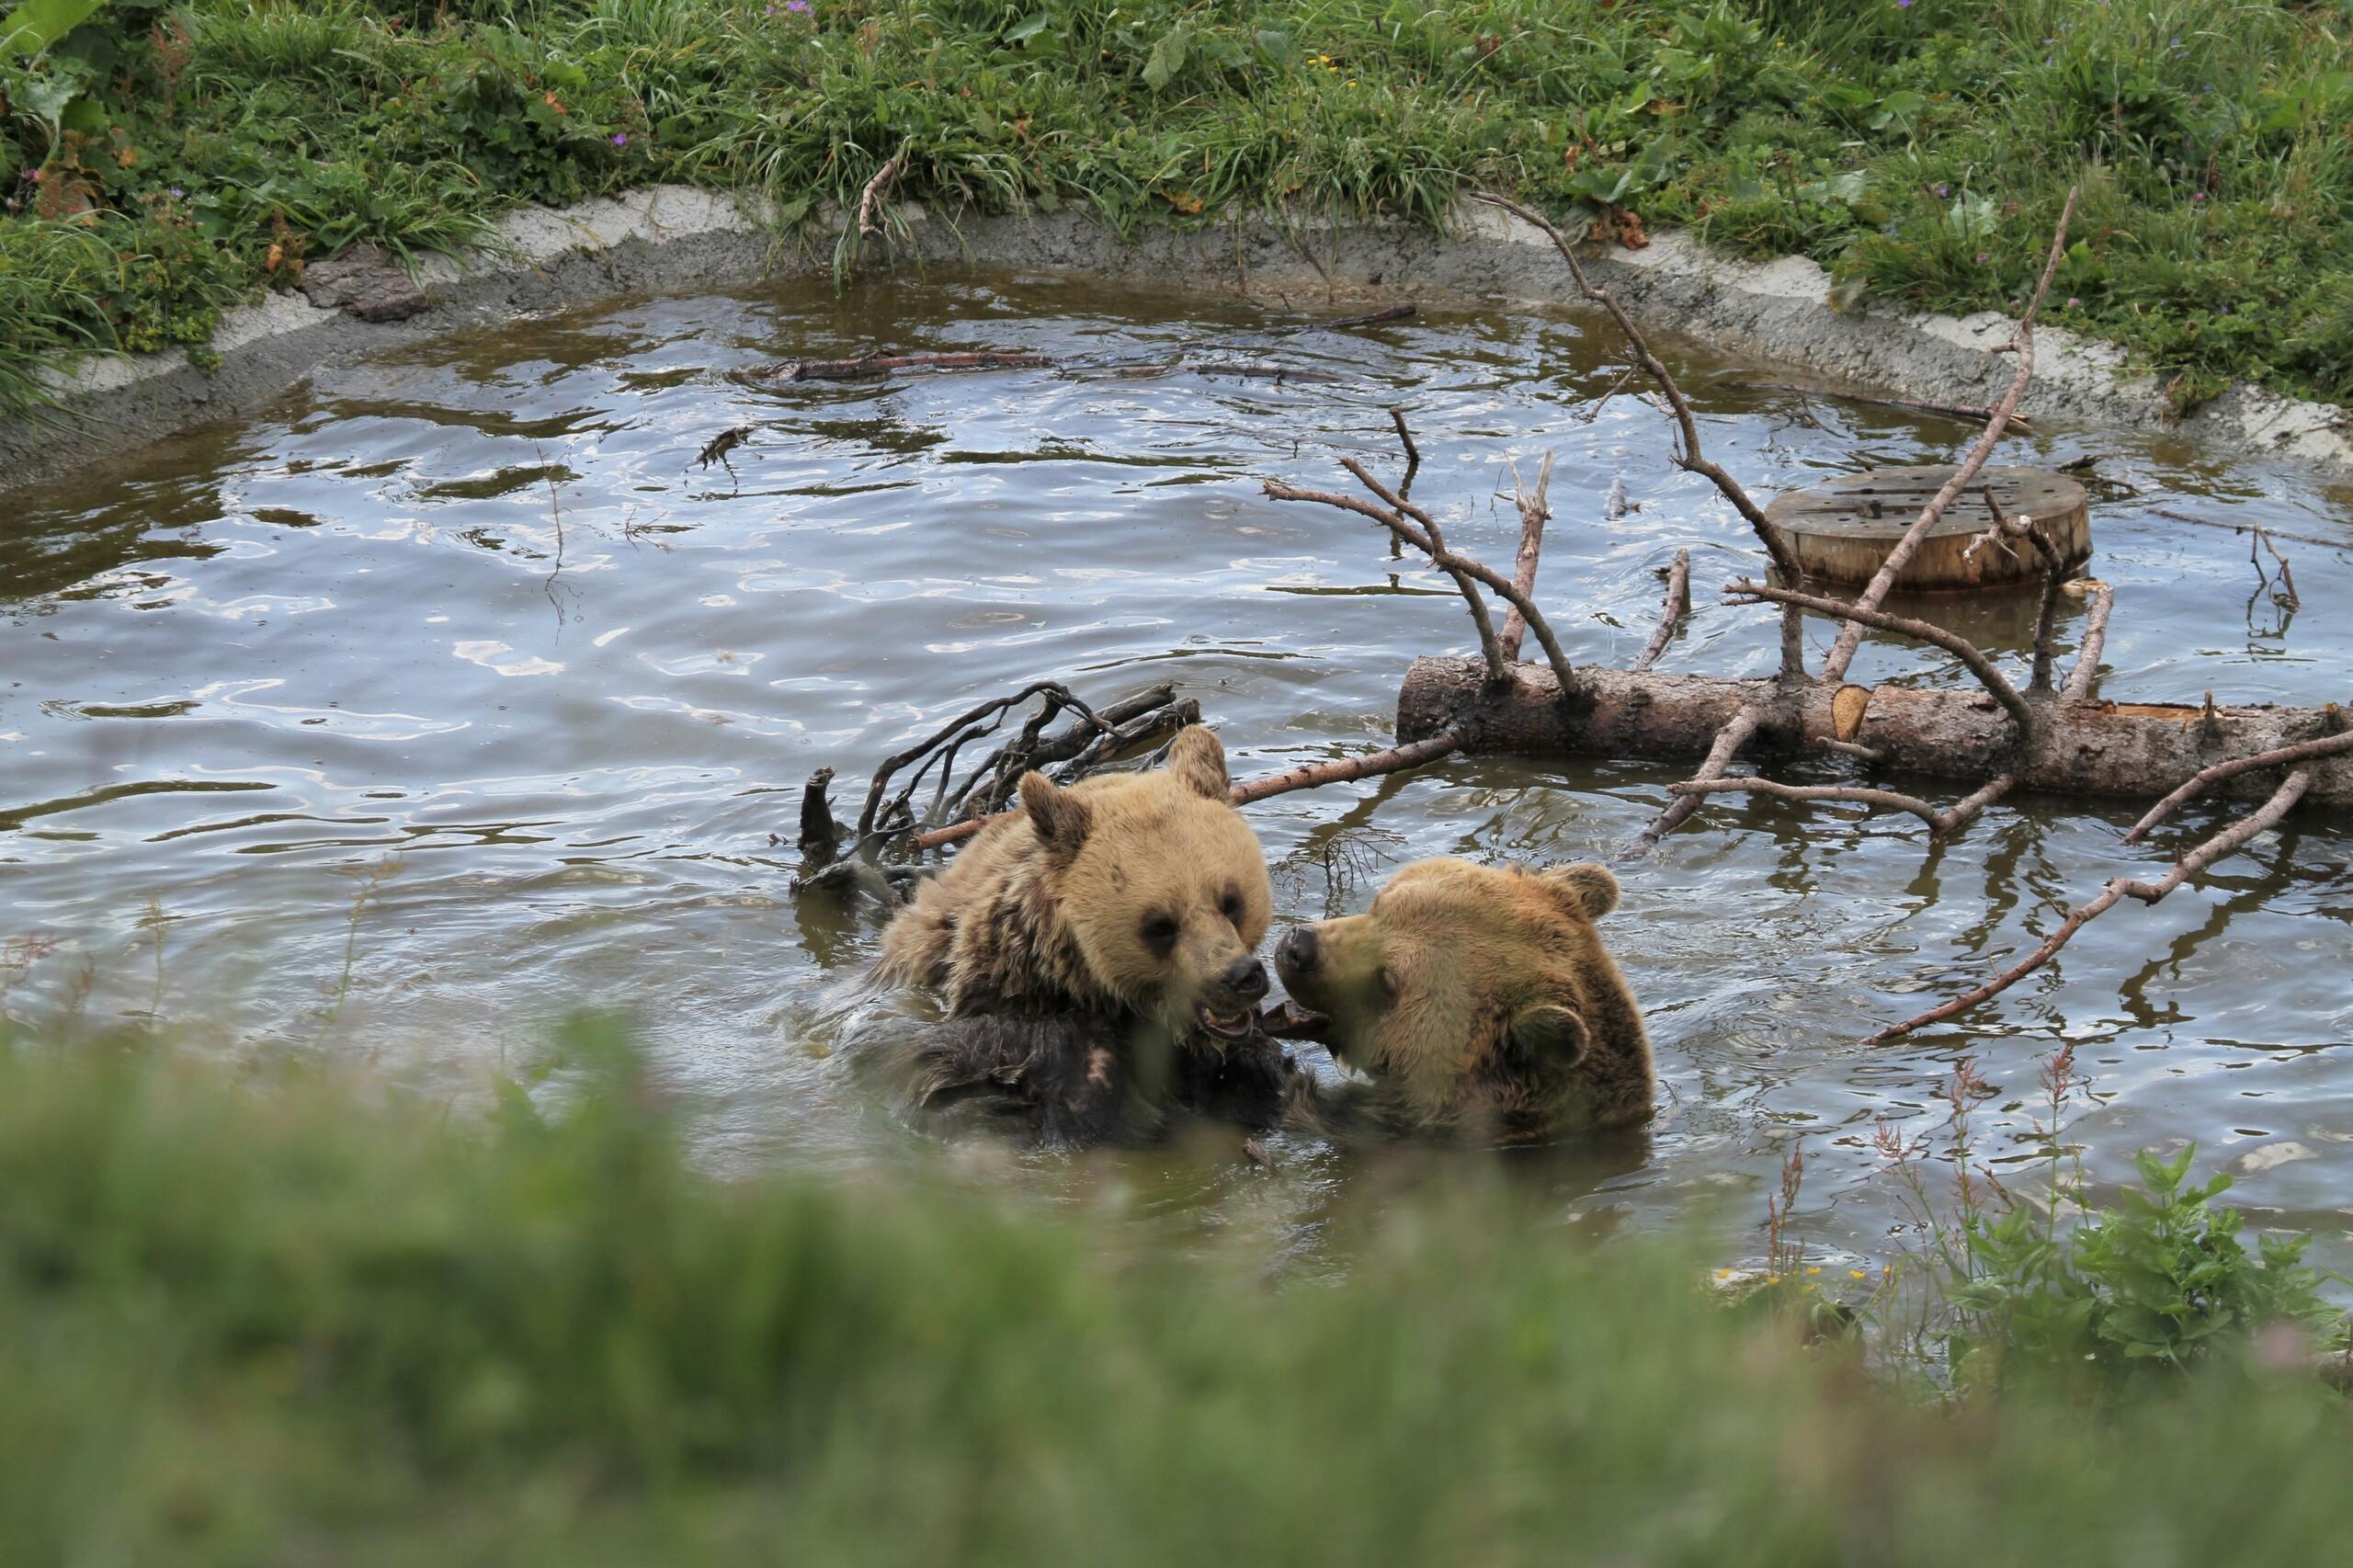 Meimo und Amelia im Teich